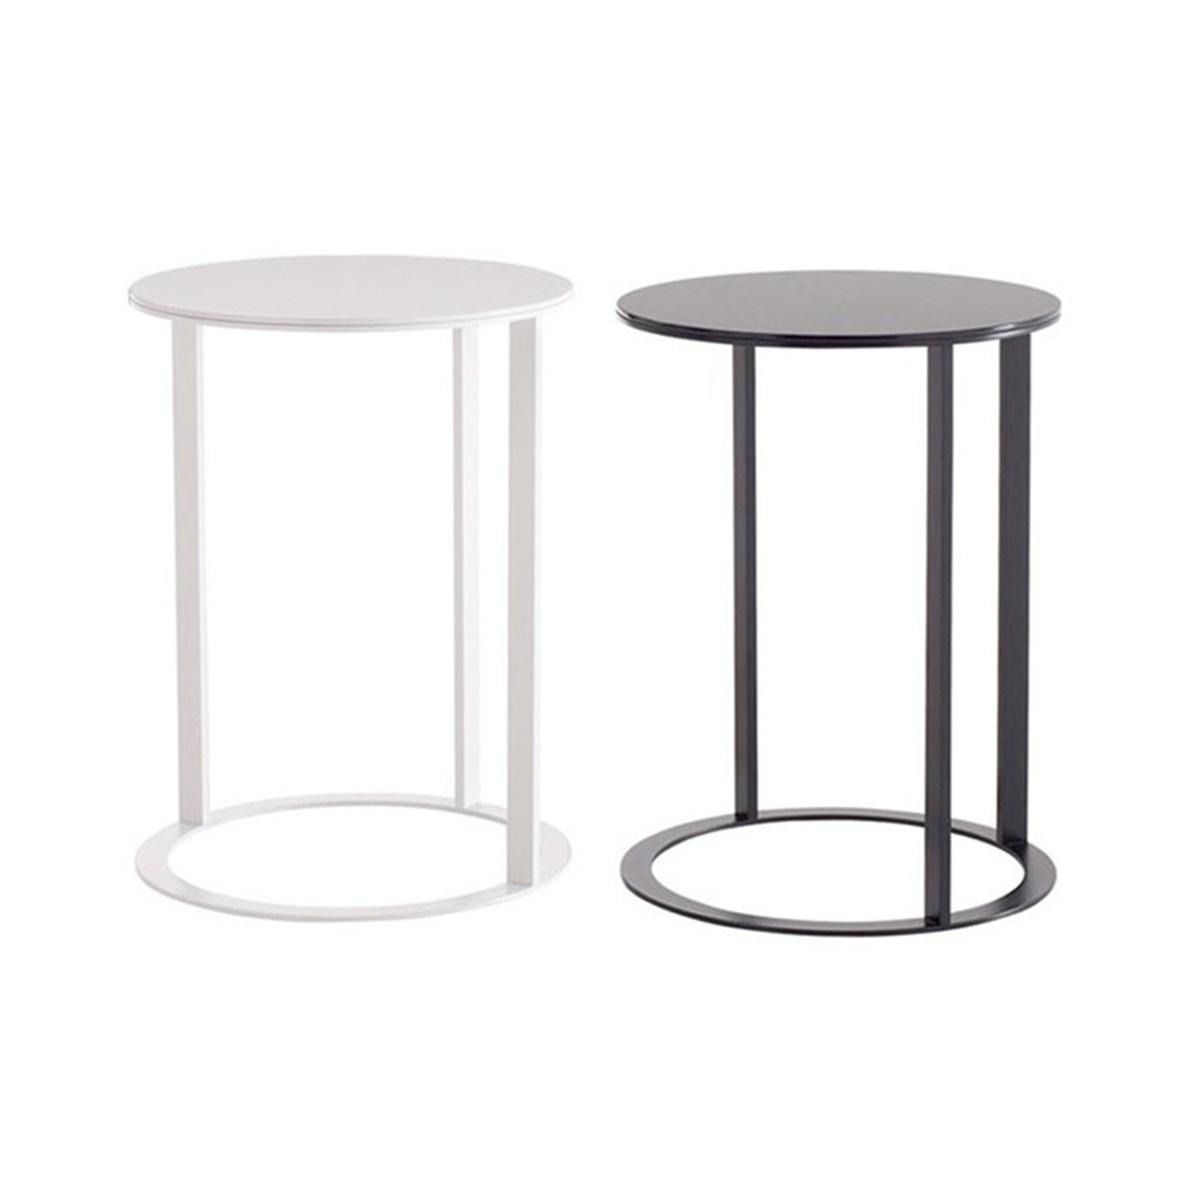 B&B-Italia-Antonio-Citterio-Frank-Small-Table-Matisse-2